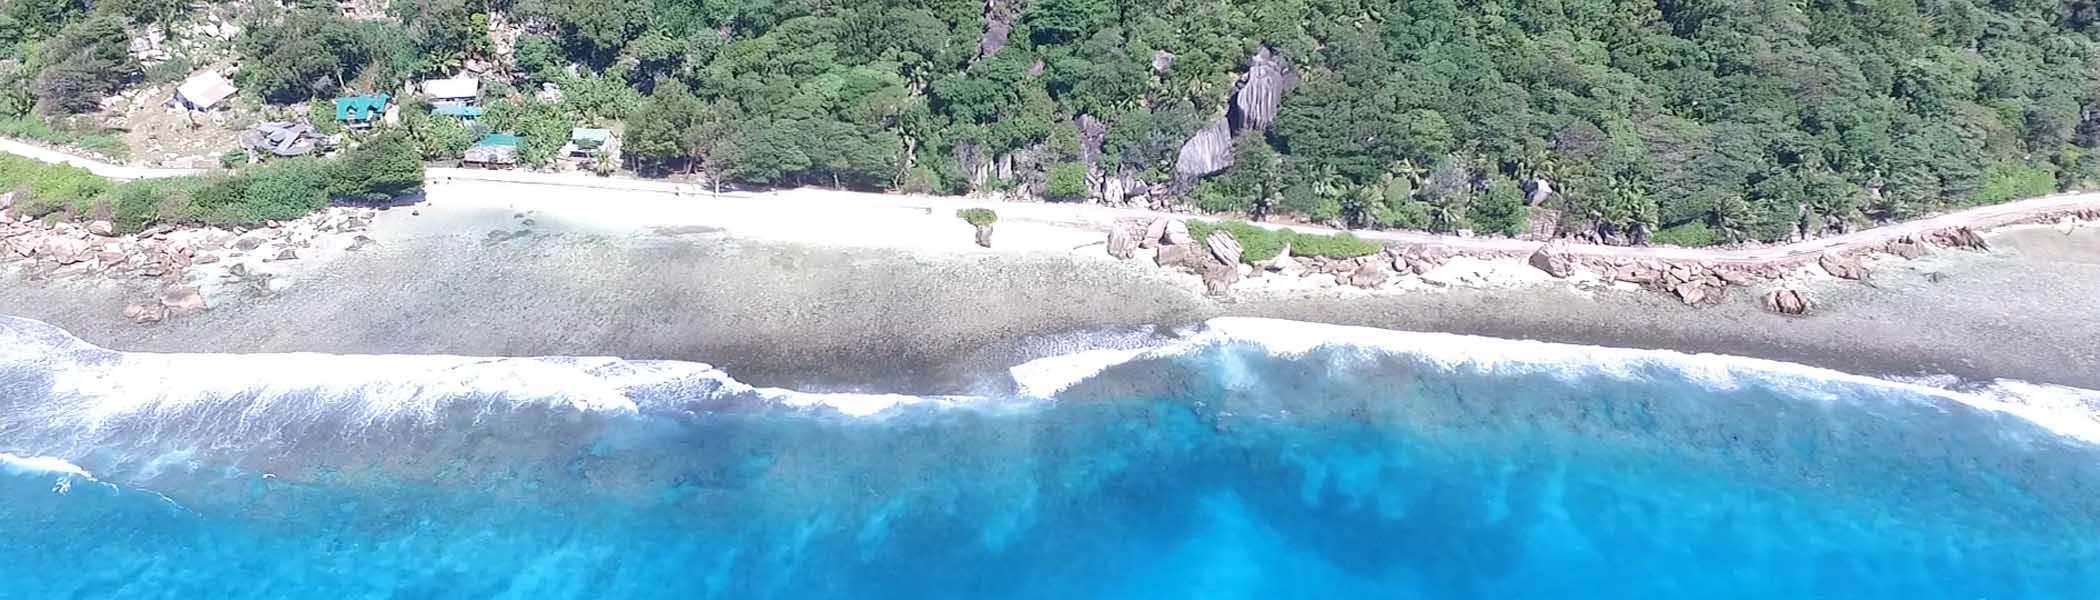 anse-banane, Beaches in Seychelles Islands